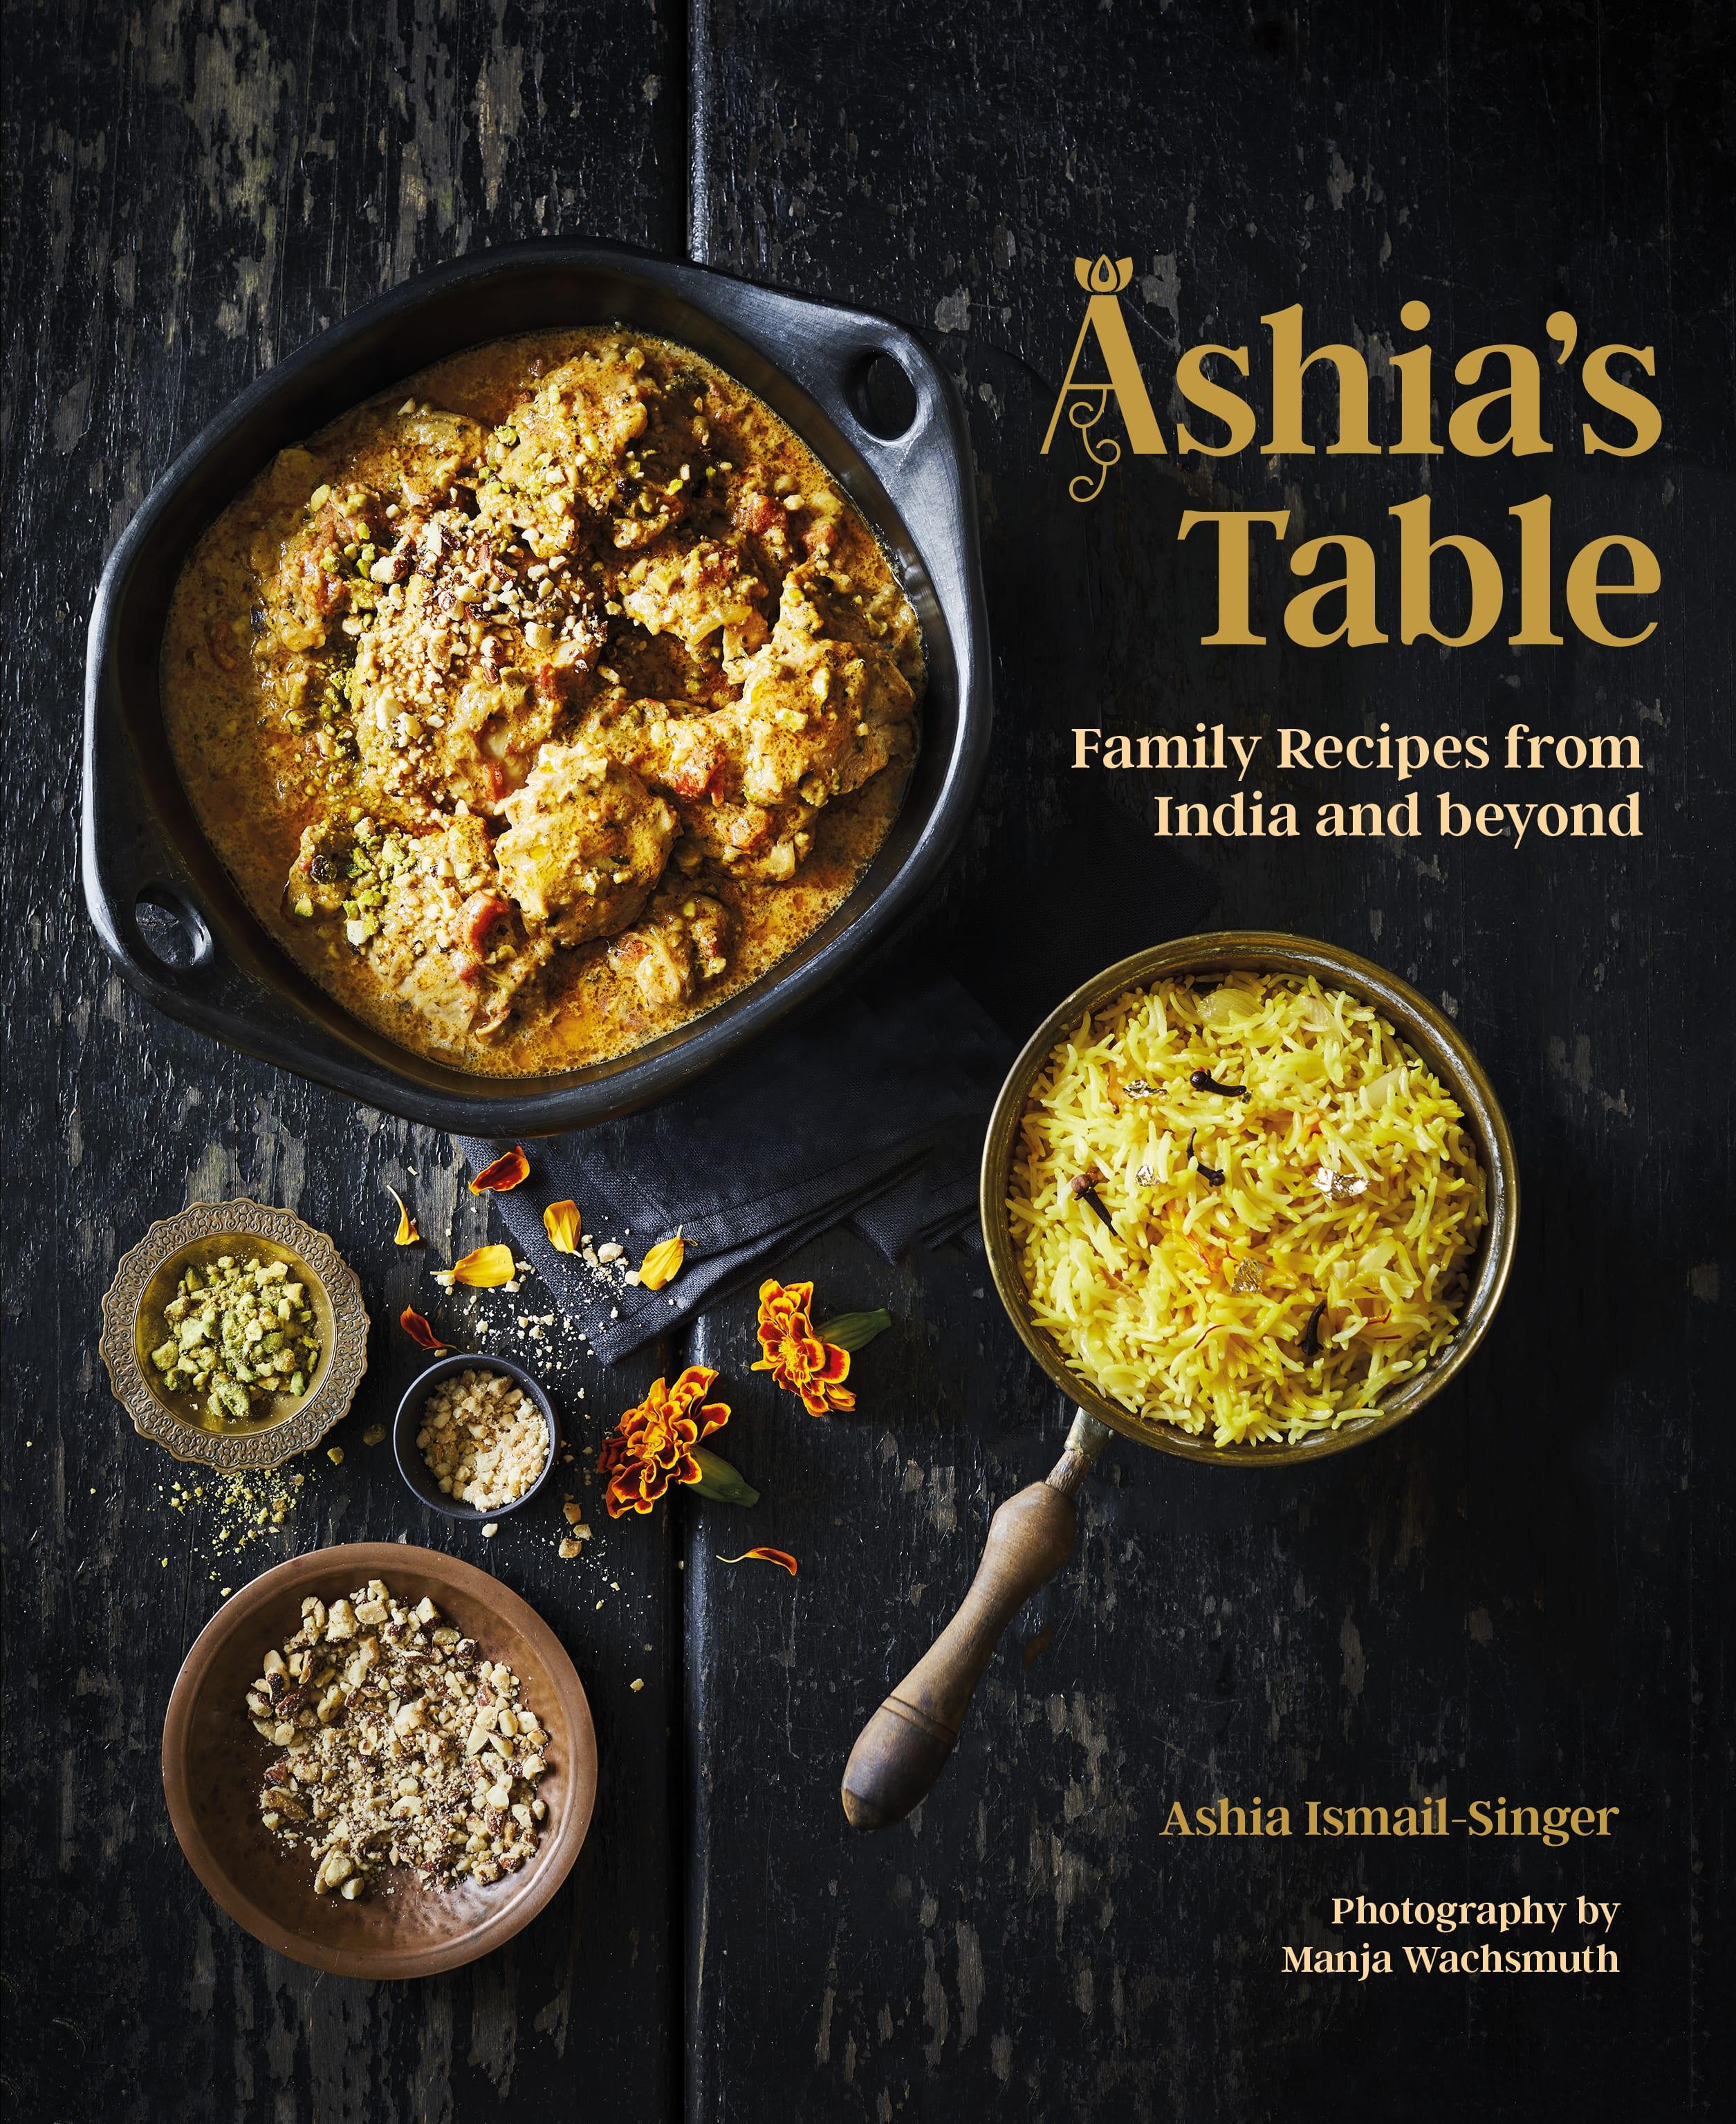 Ashia's Table